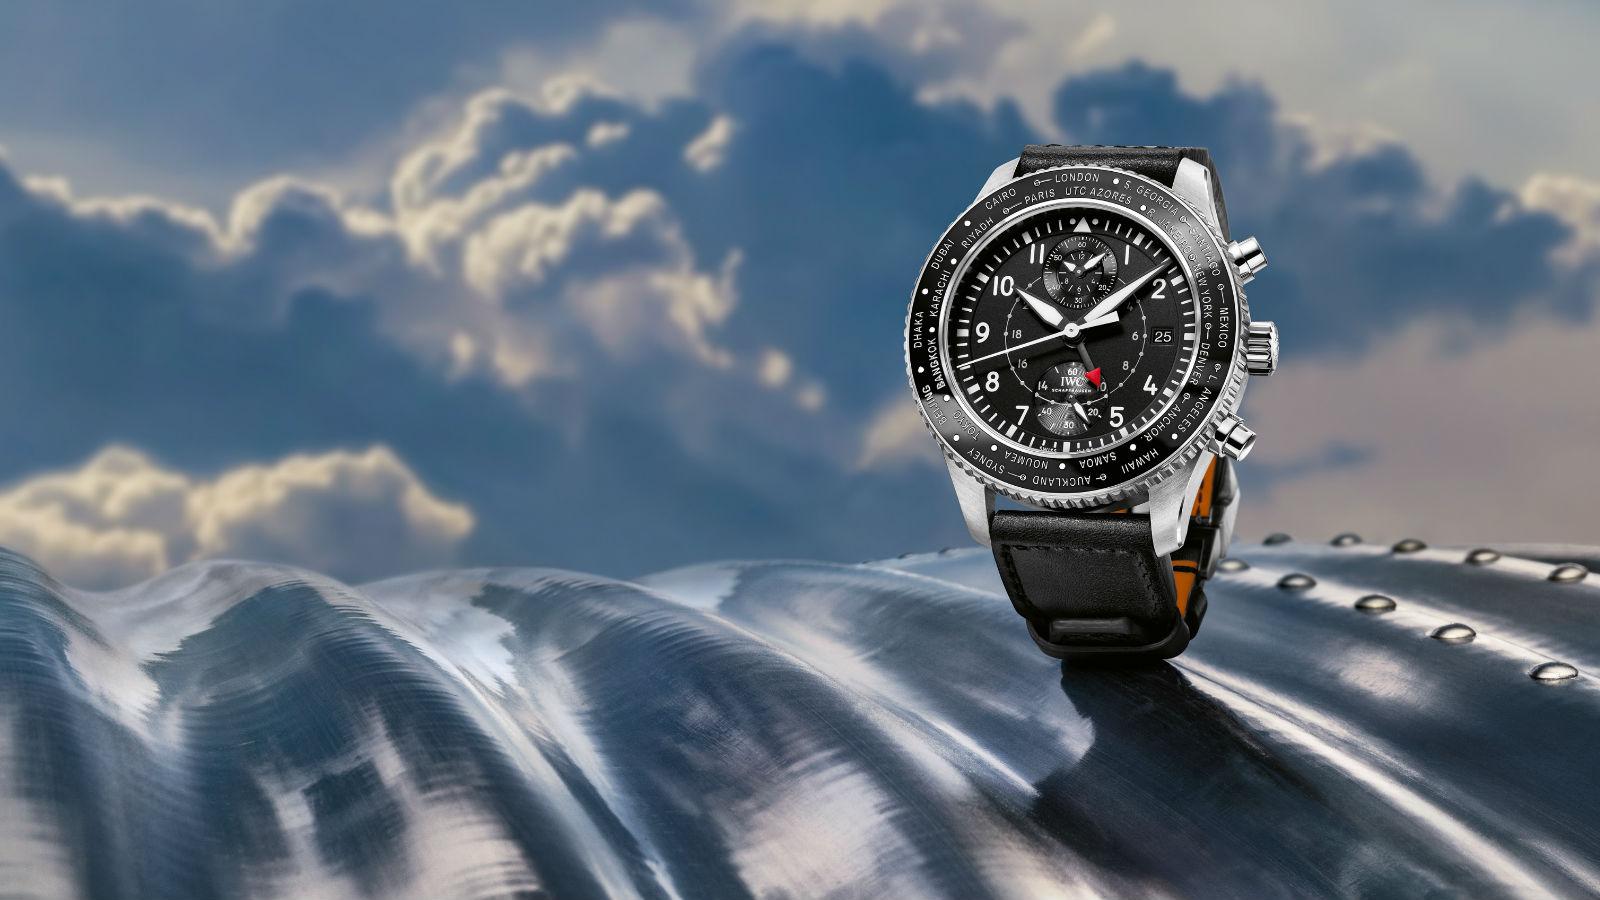 IWC Schaffhausen - Pilot's Watch Timezoner Chronograph